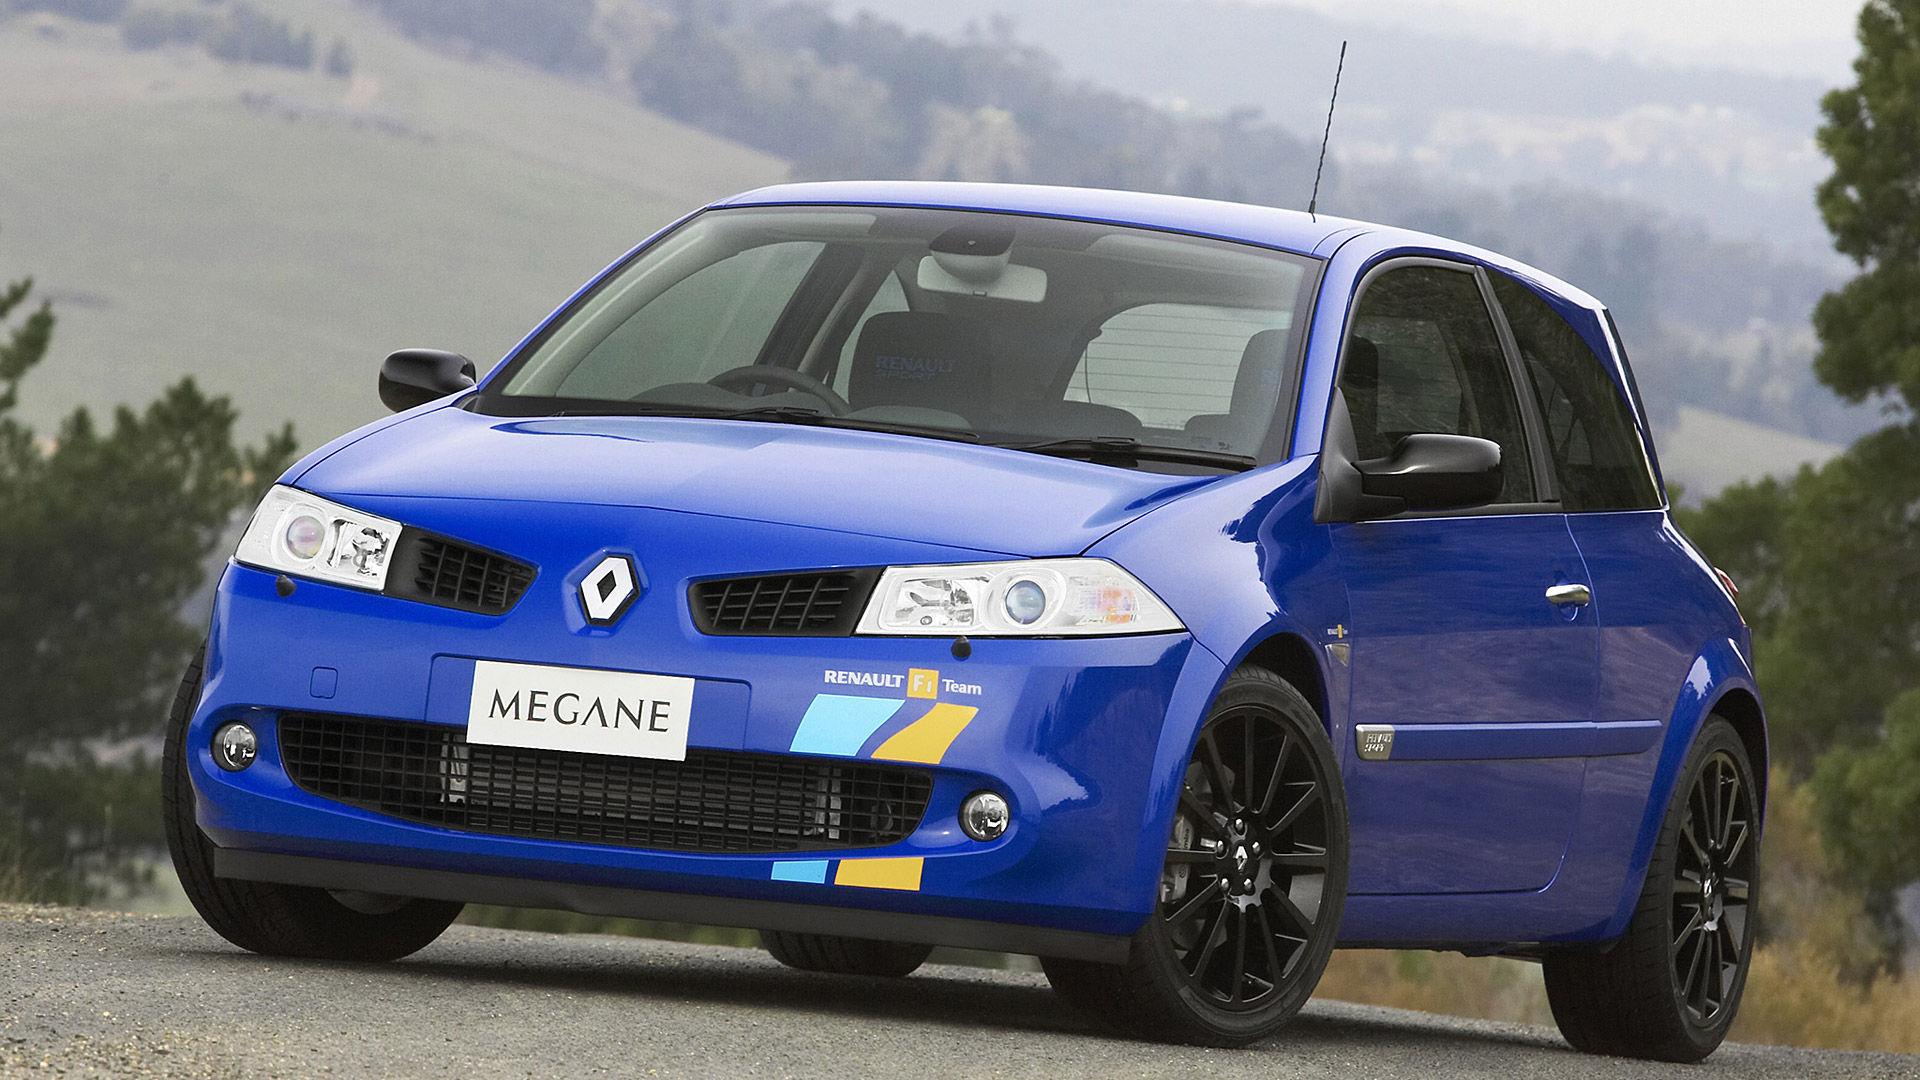 2006 Renault Megane RS F1 Team